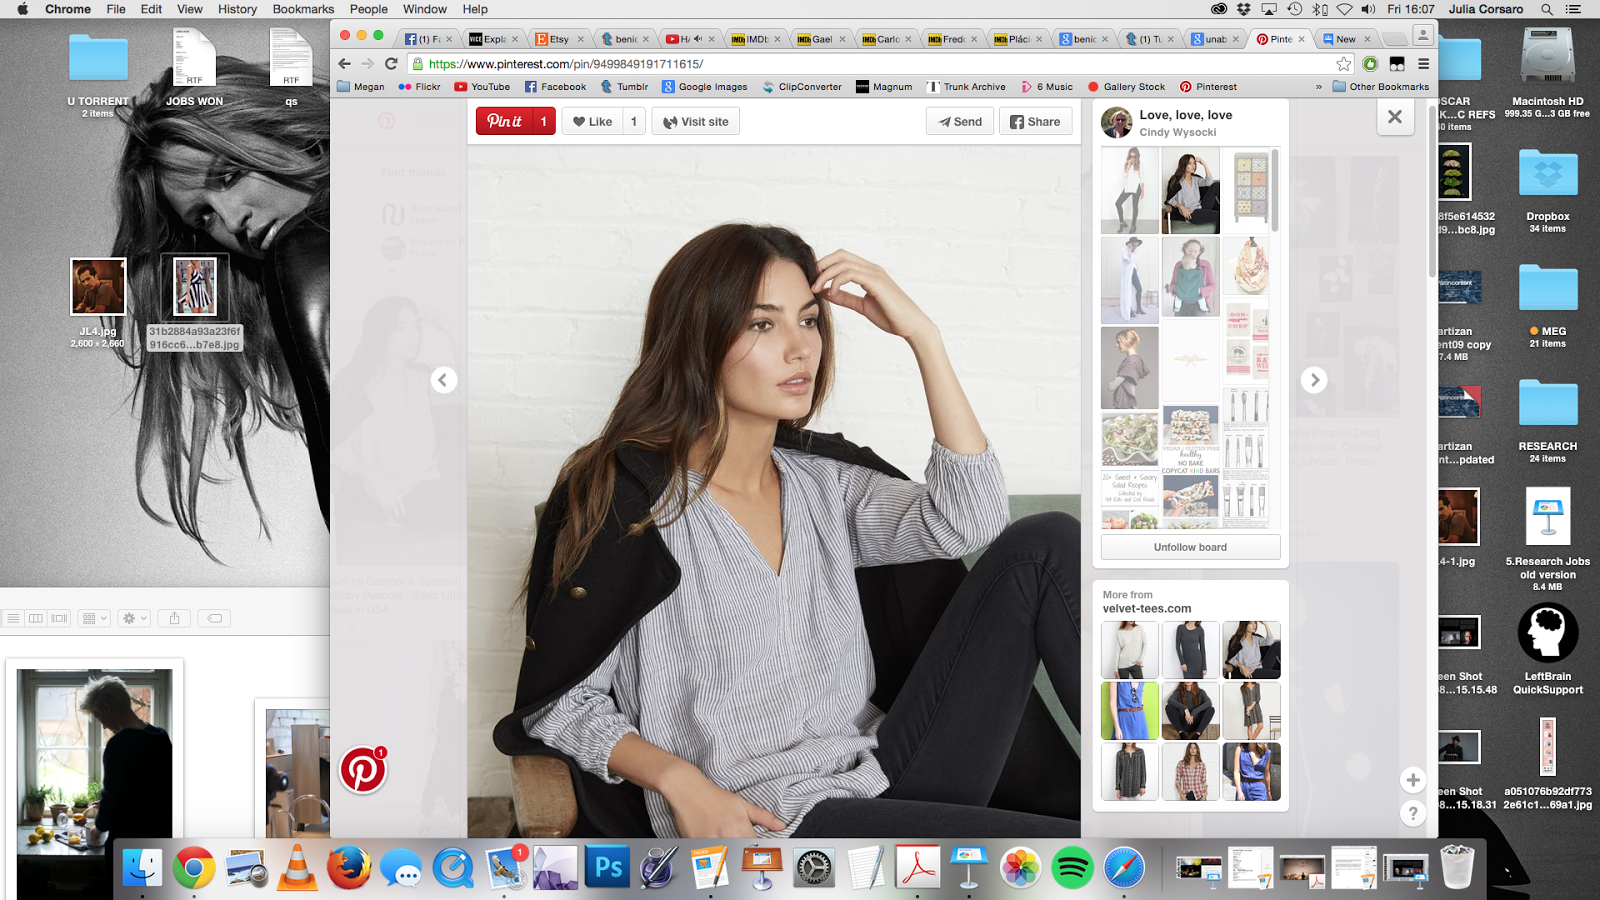 Problems dragging image from pinterest to desktop - Google